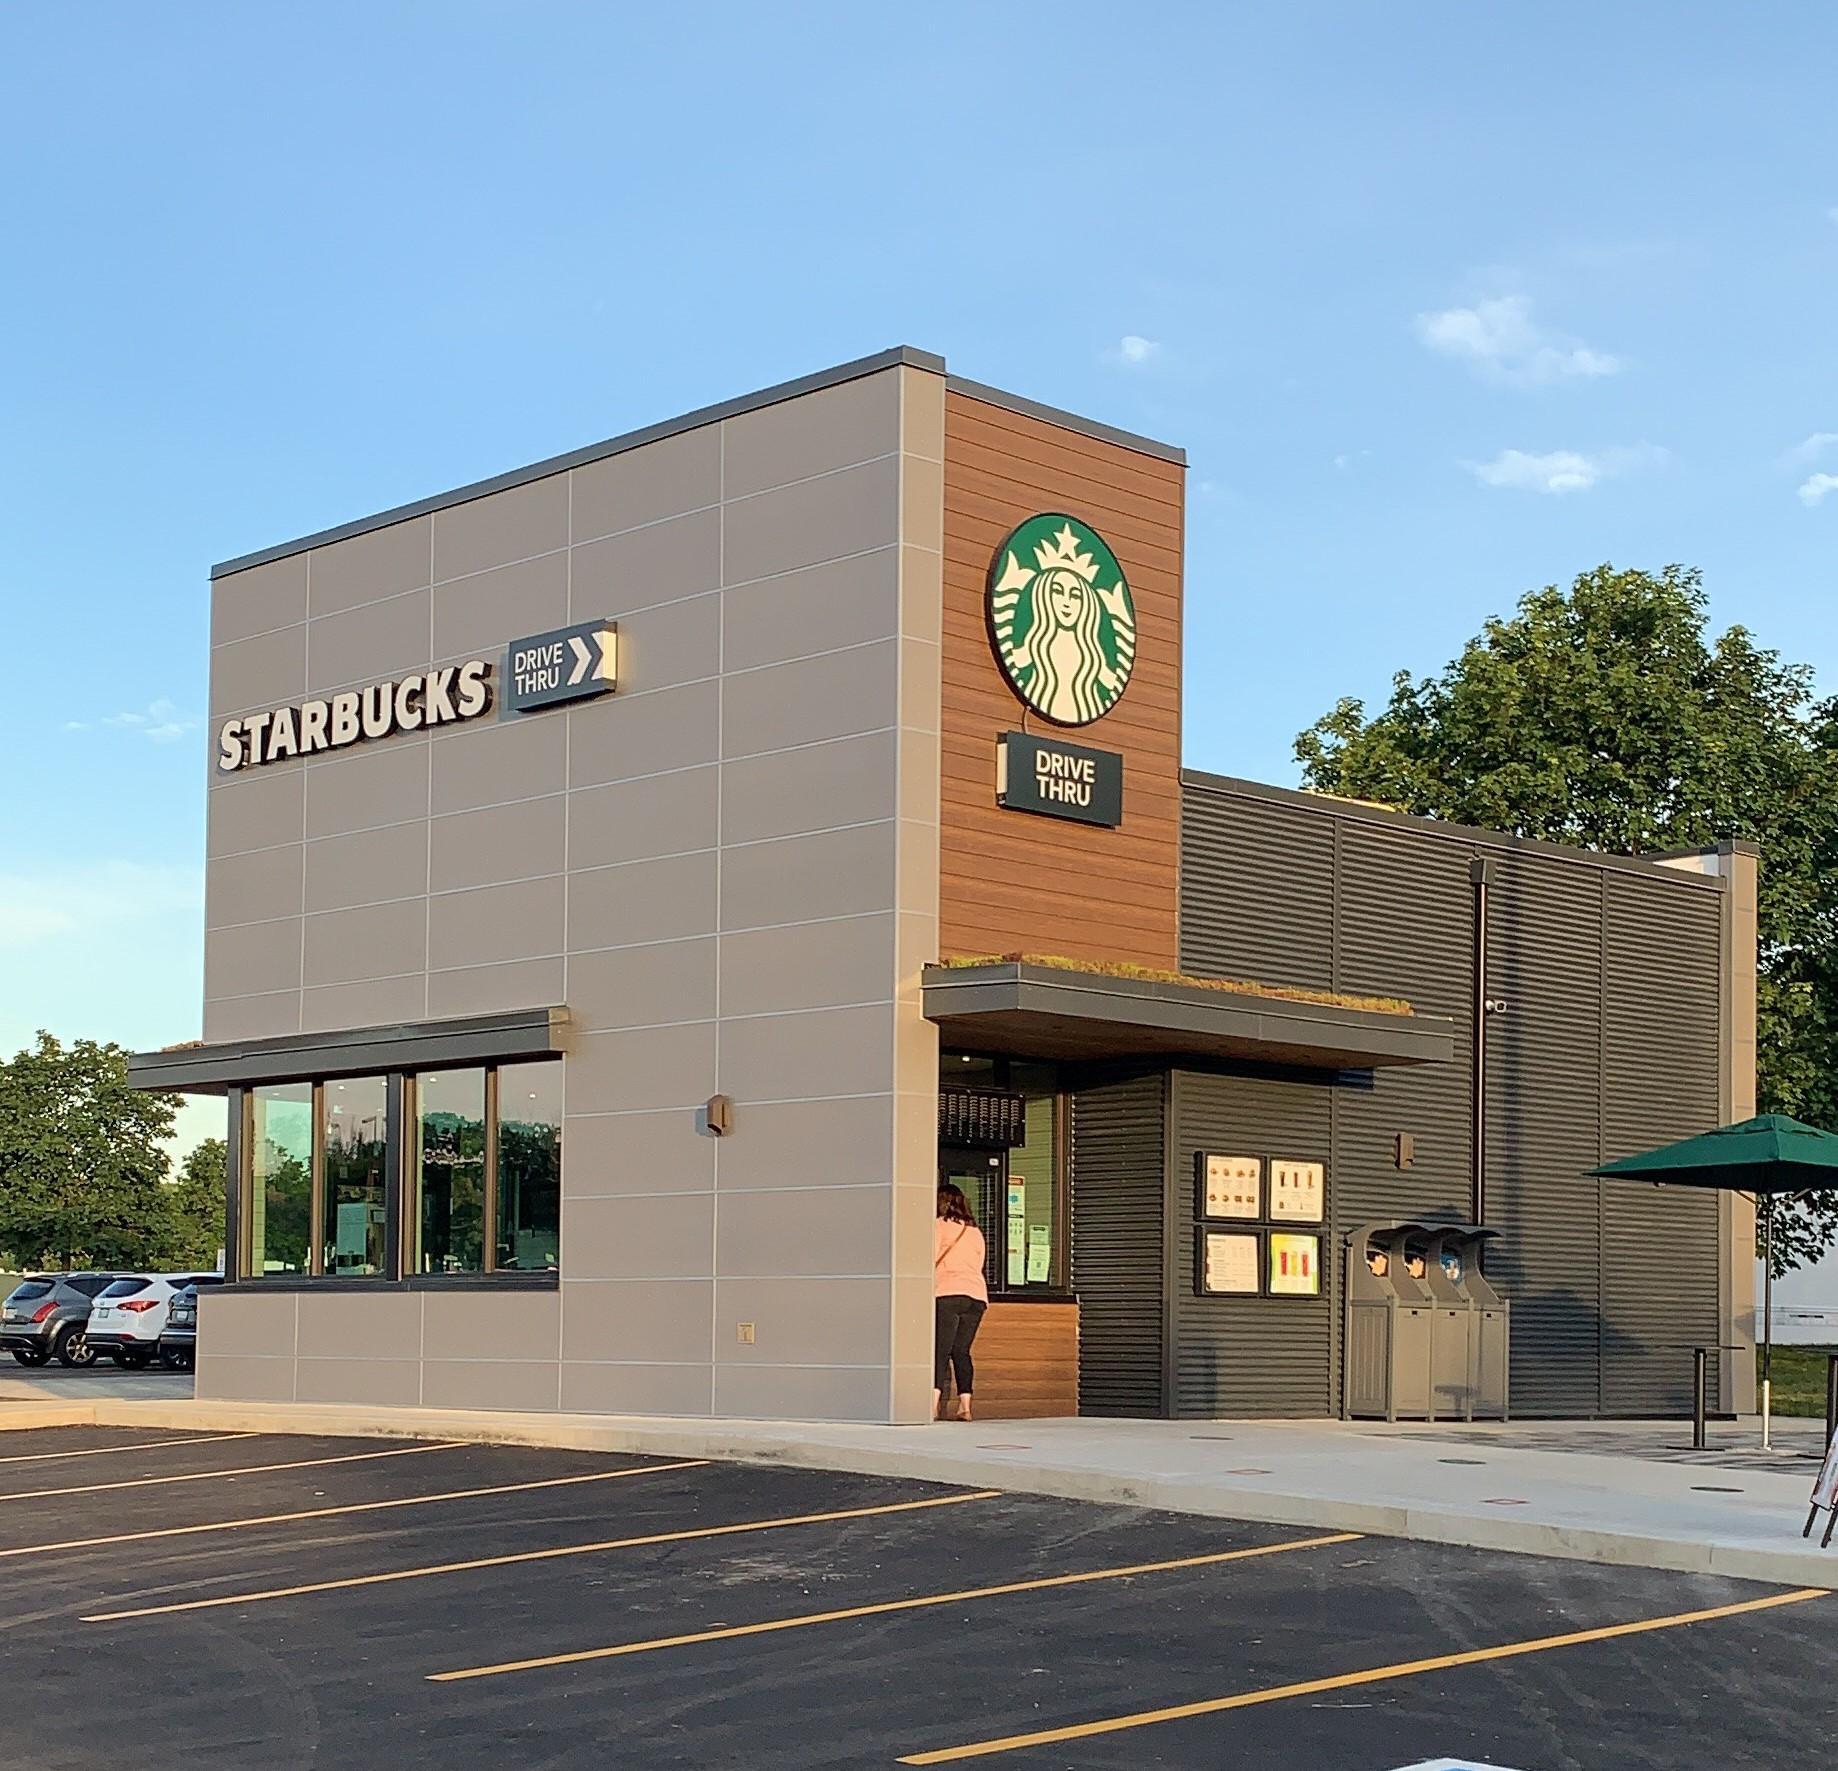 Starbucks building with walk-up window and drive-thru